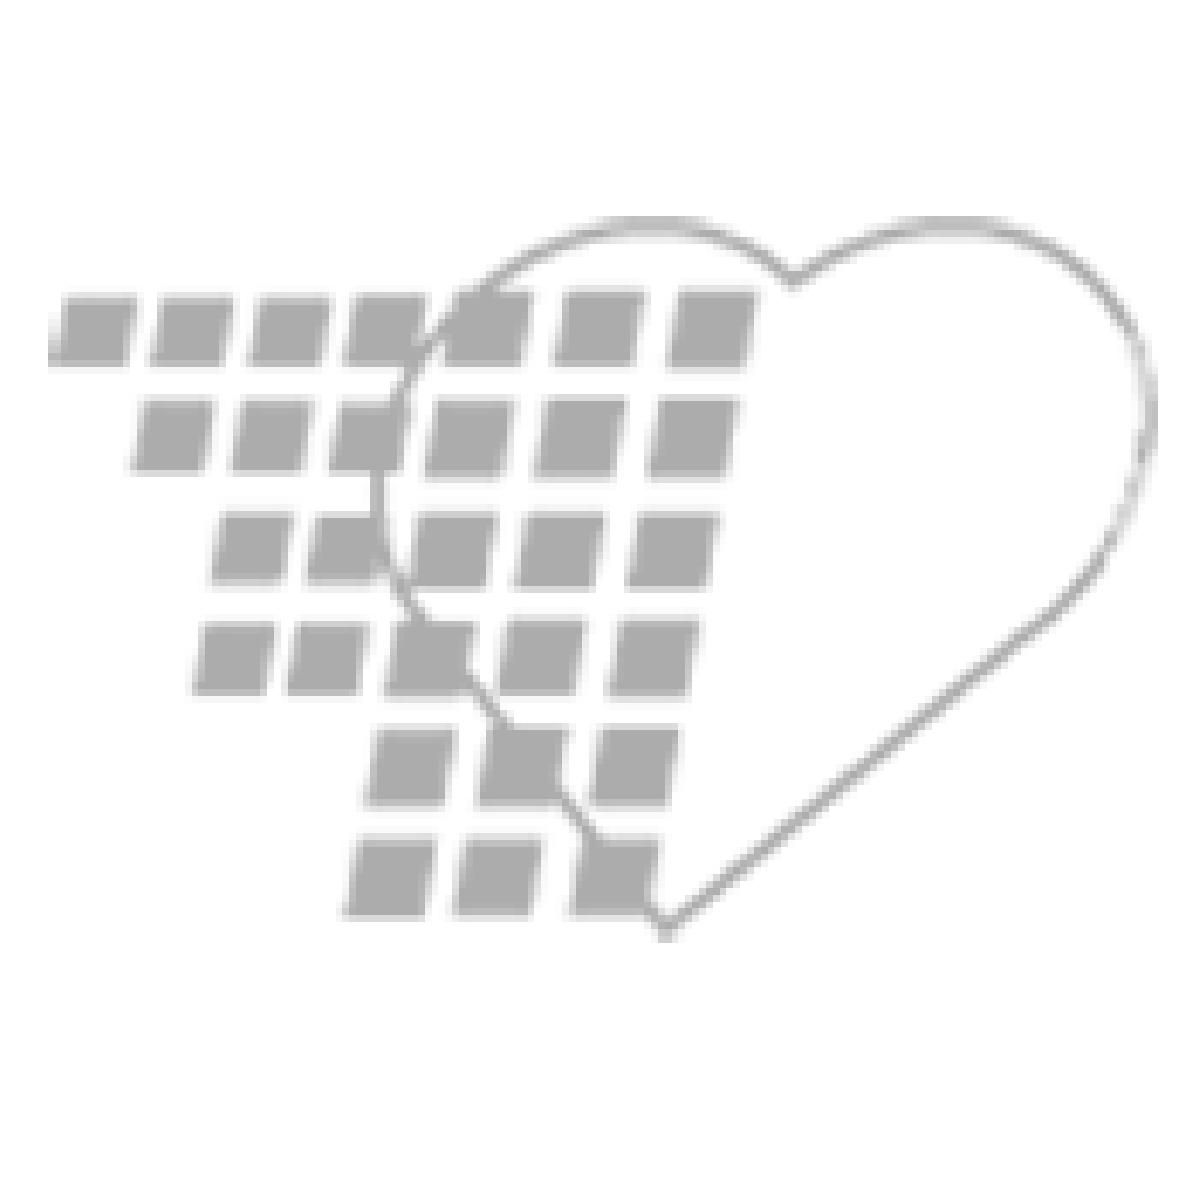 05-74-0902 - DawnMist® Shampoo and Body Bath - 2oz